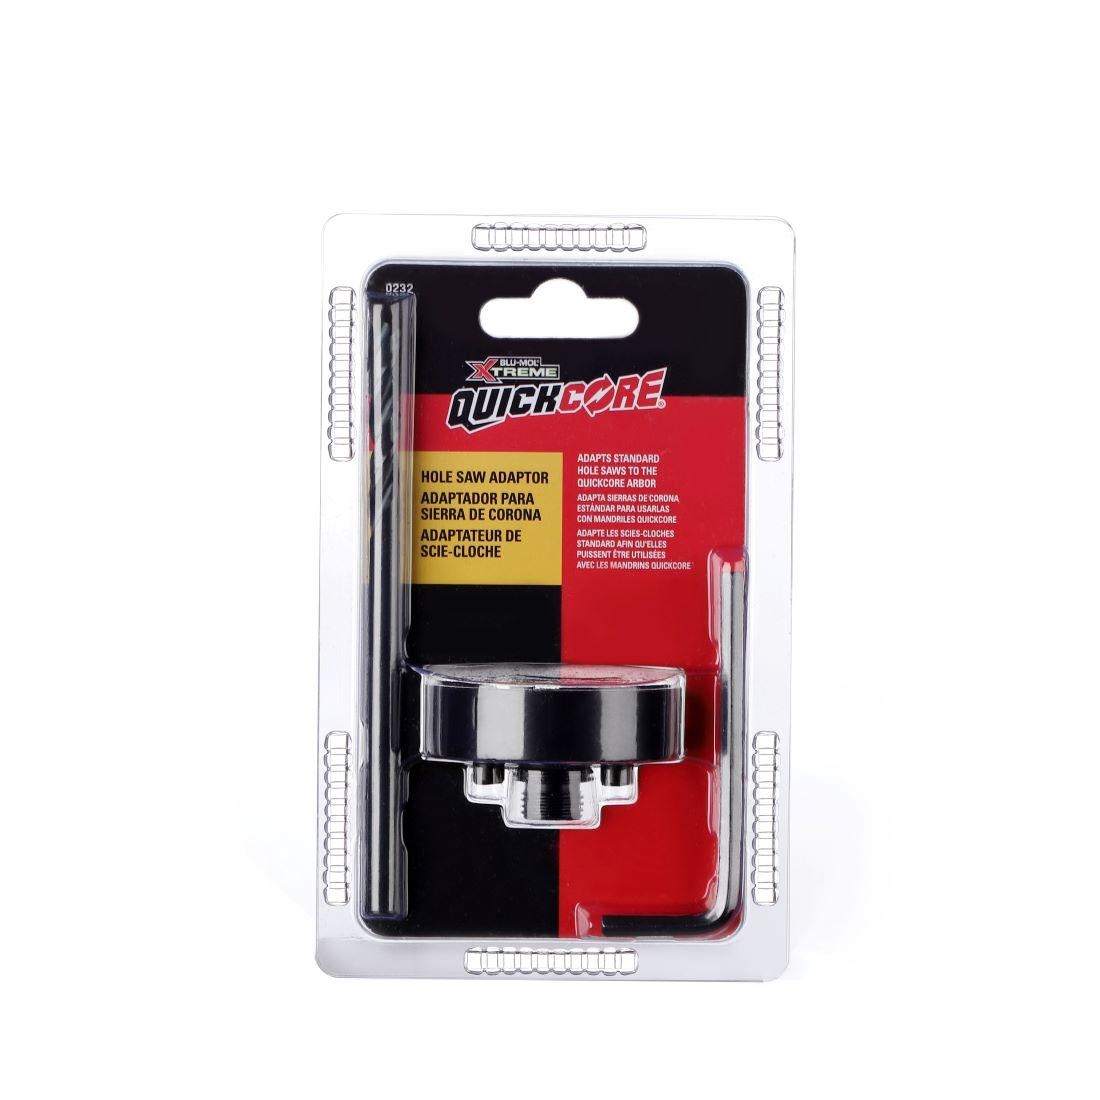 Xtreme Quick Core Universal Adapter 1 Piece BLXQC0232